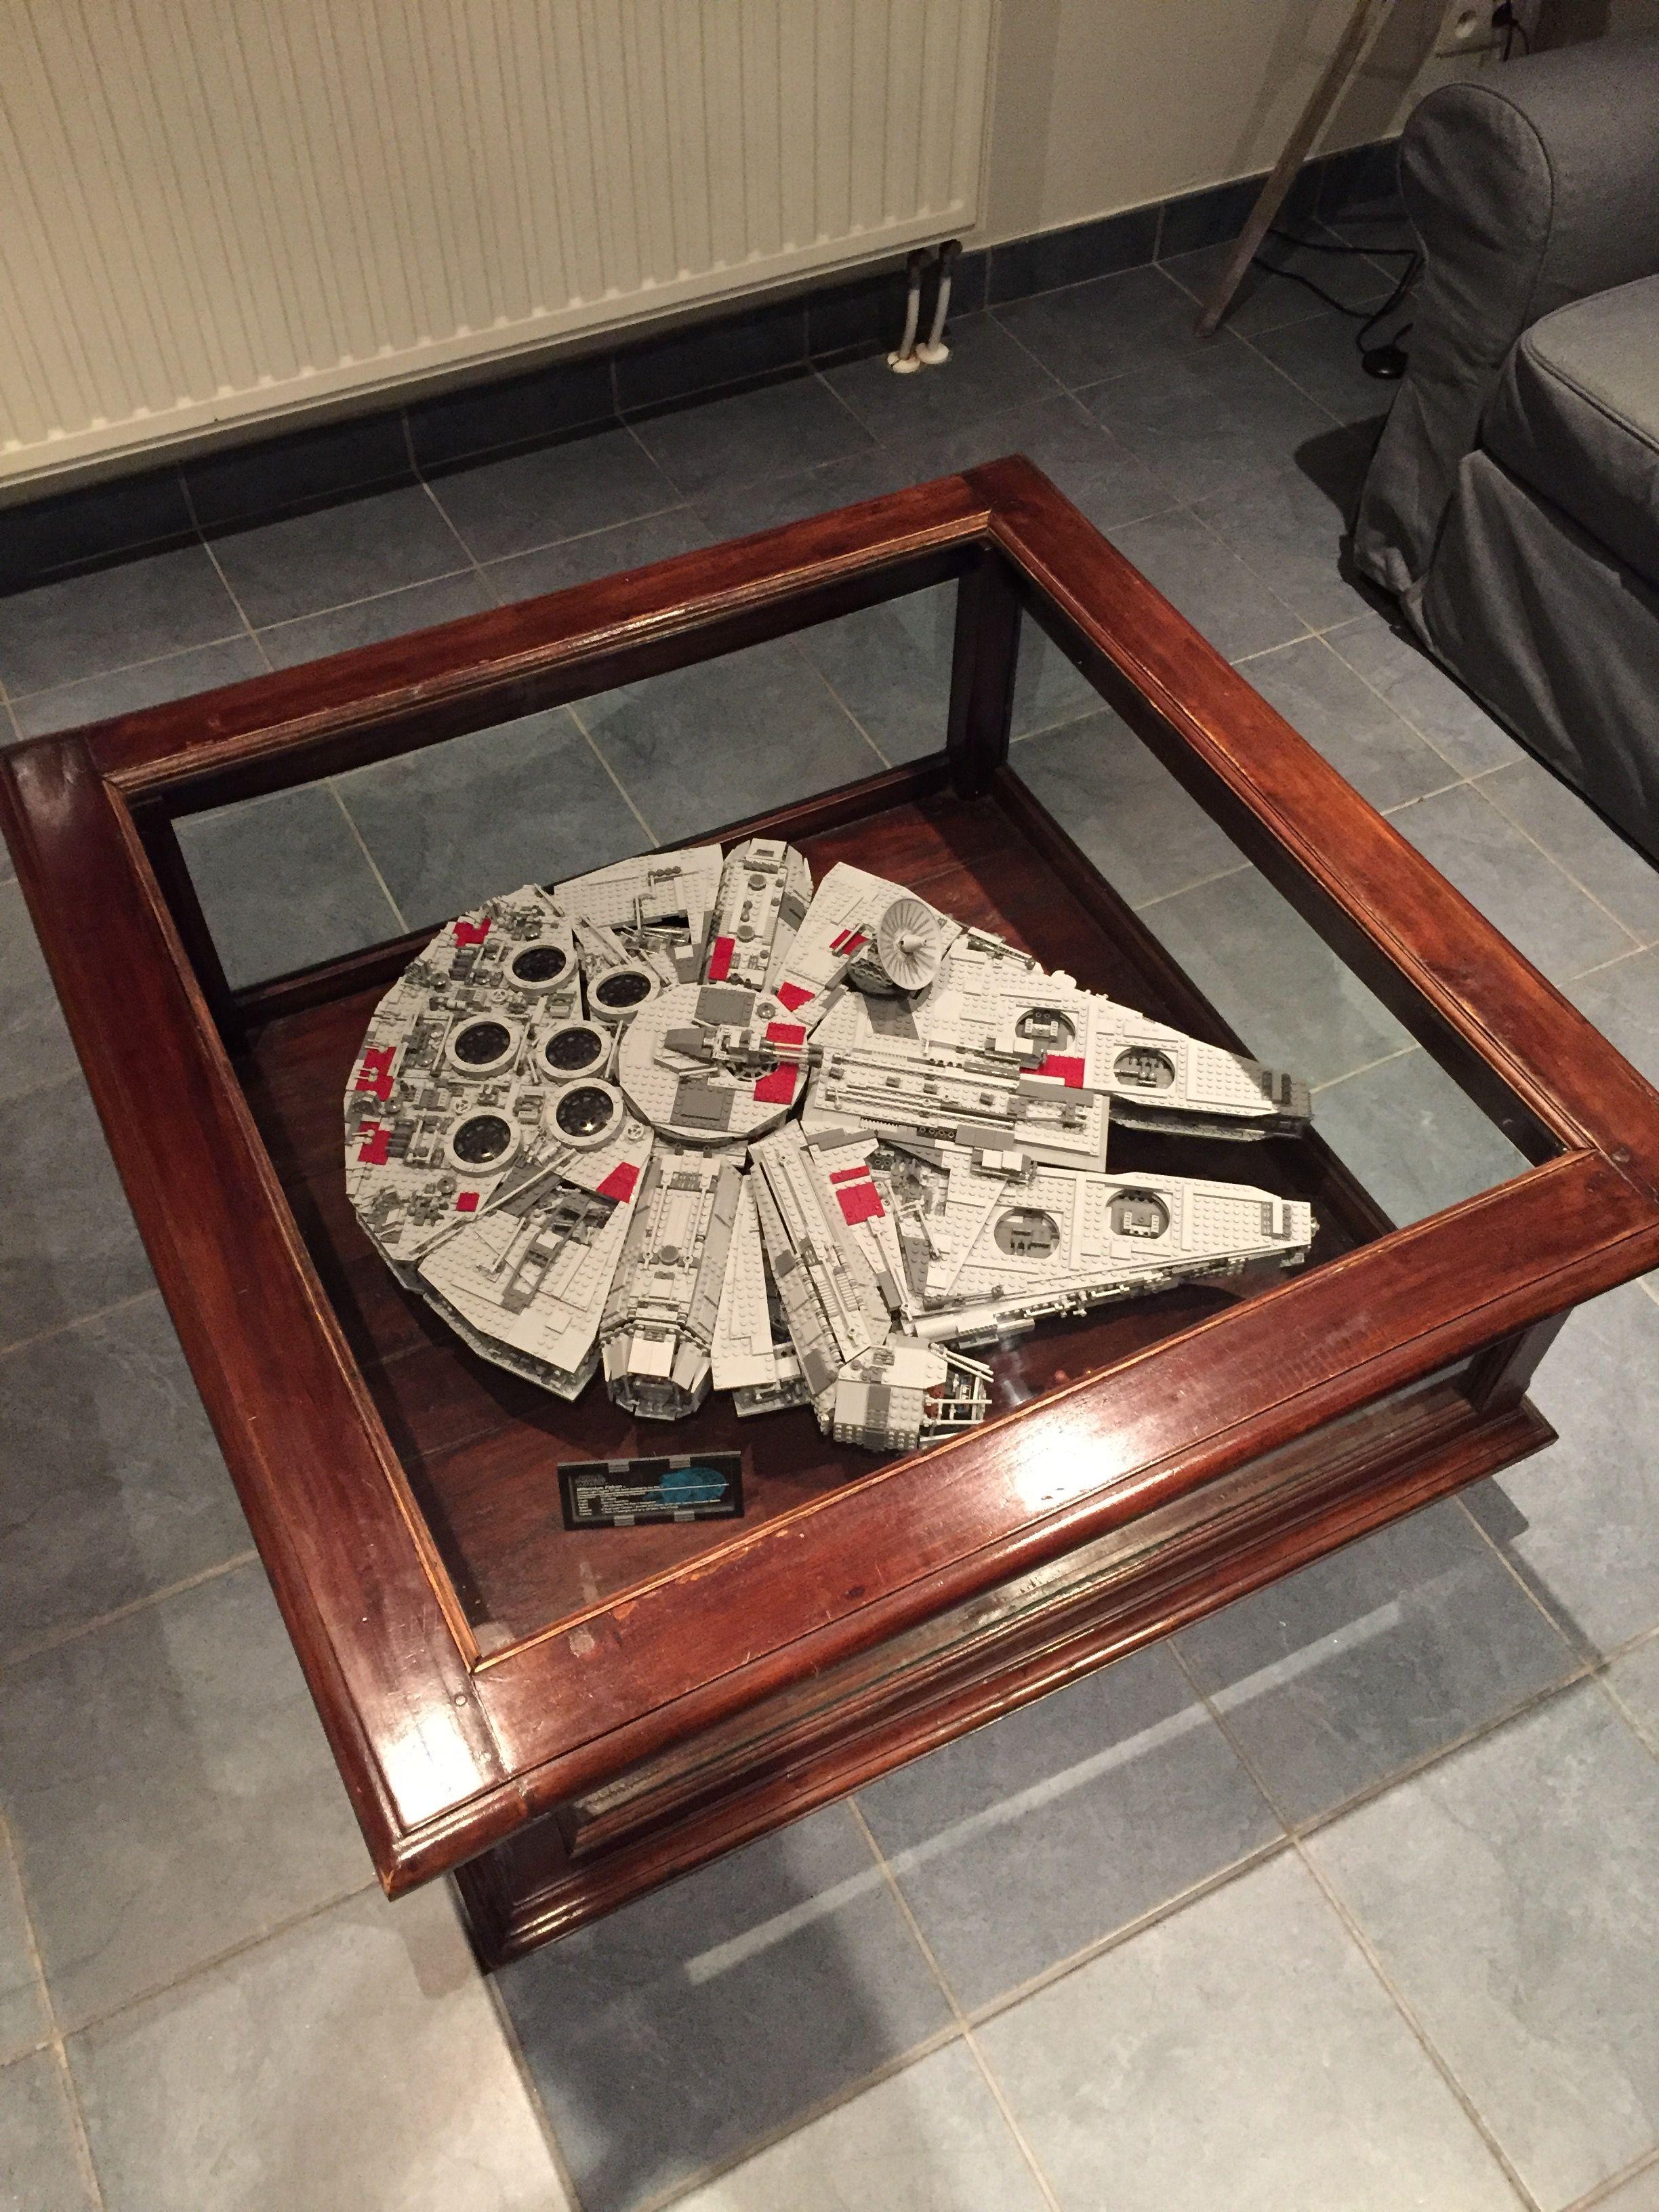 Pin By Tim Maegly On Lego Fun Star Wars Decor Star Wars Room Lego Millenium Falcon [ 3264 x 2448 Pixel ]